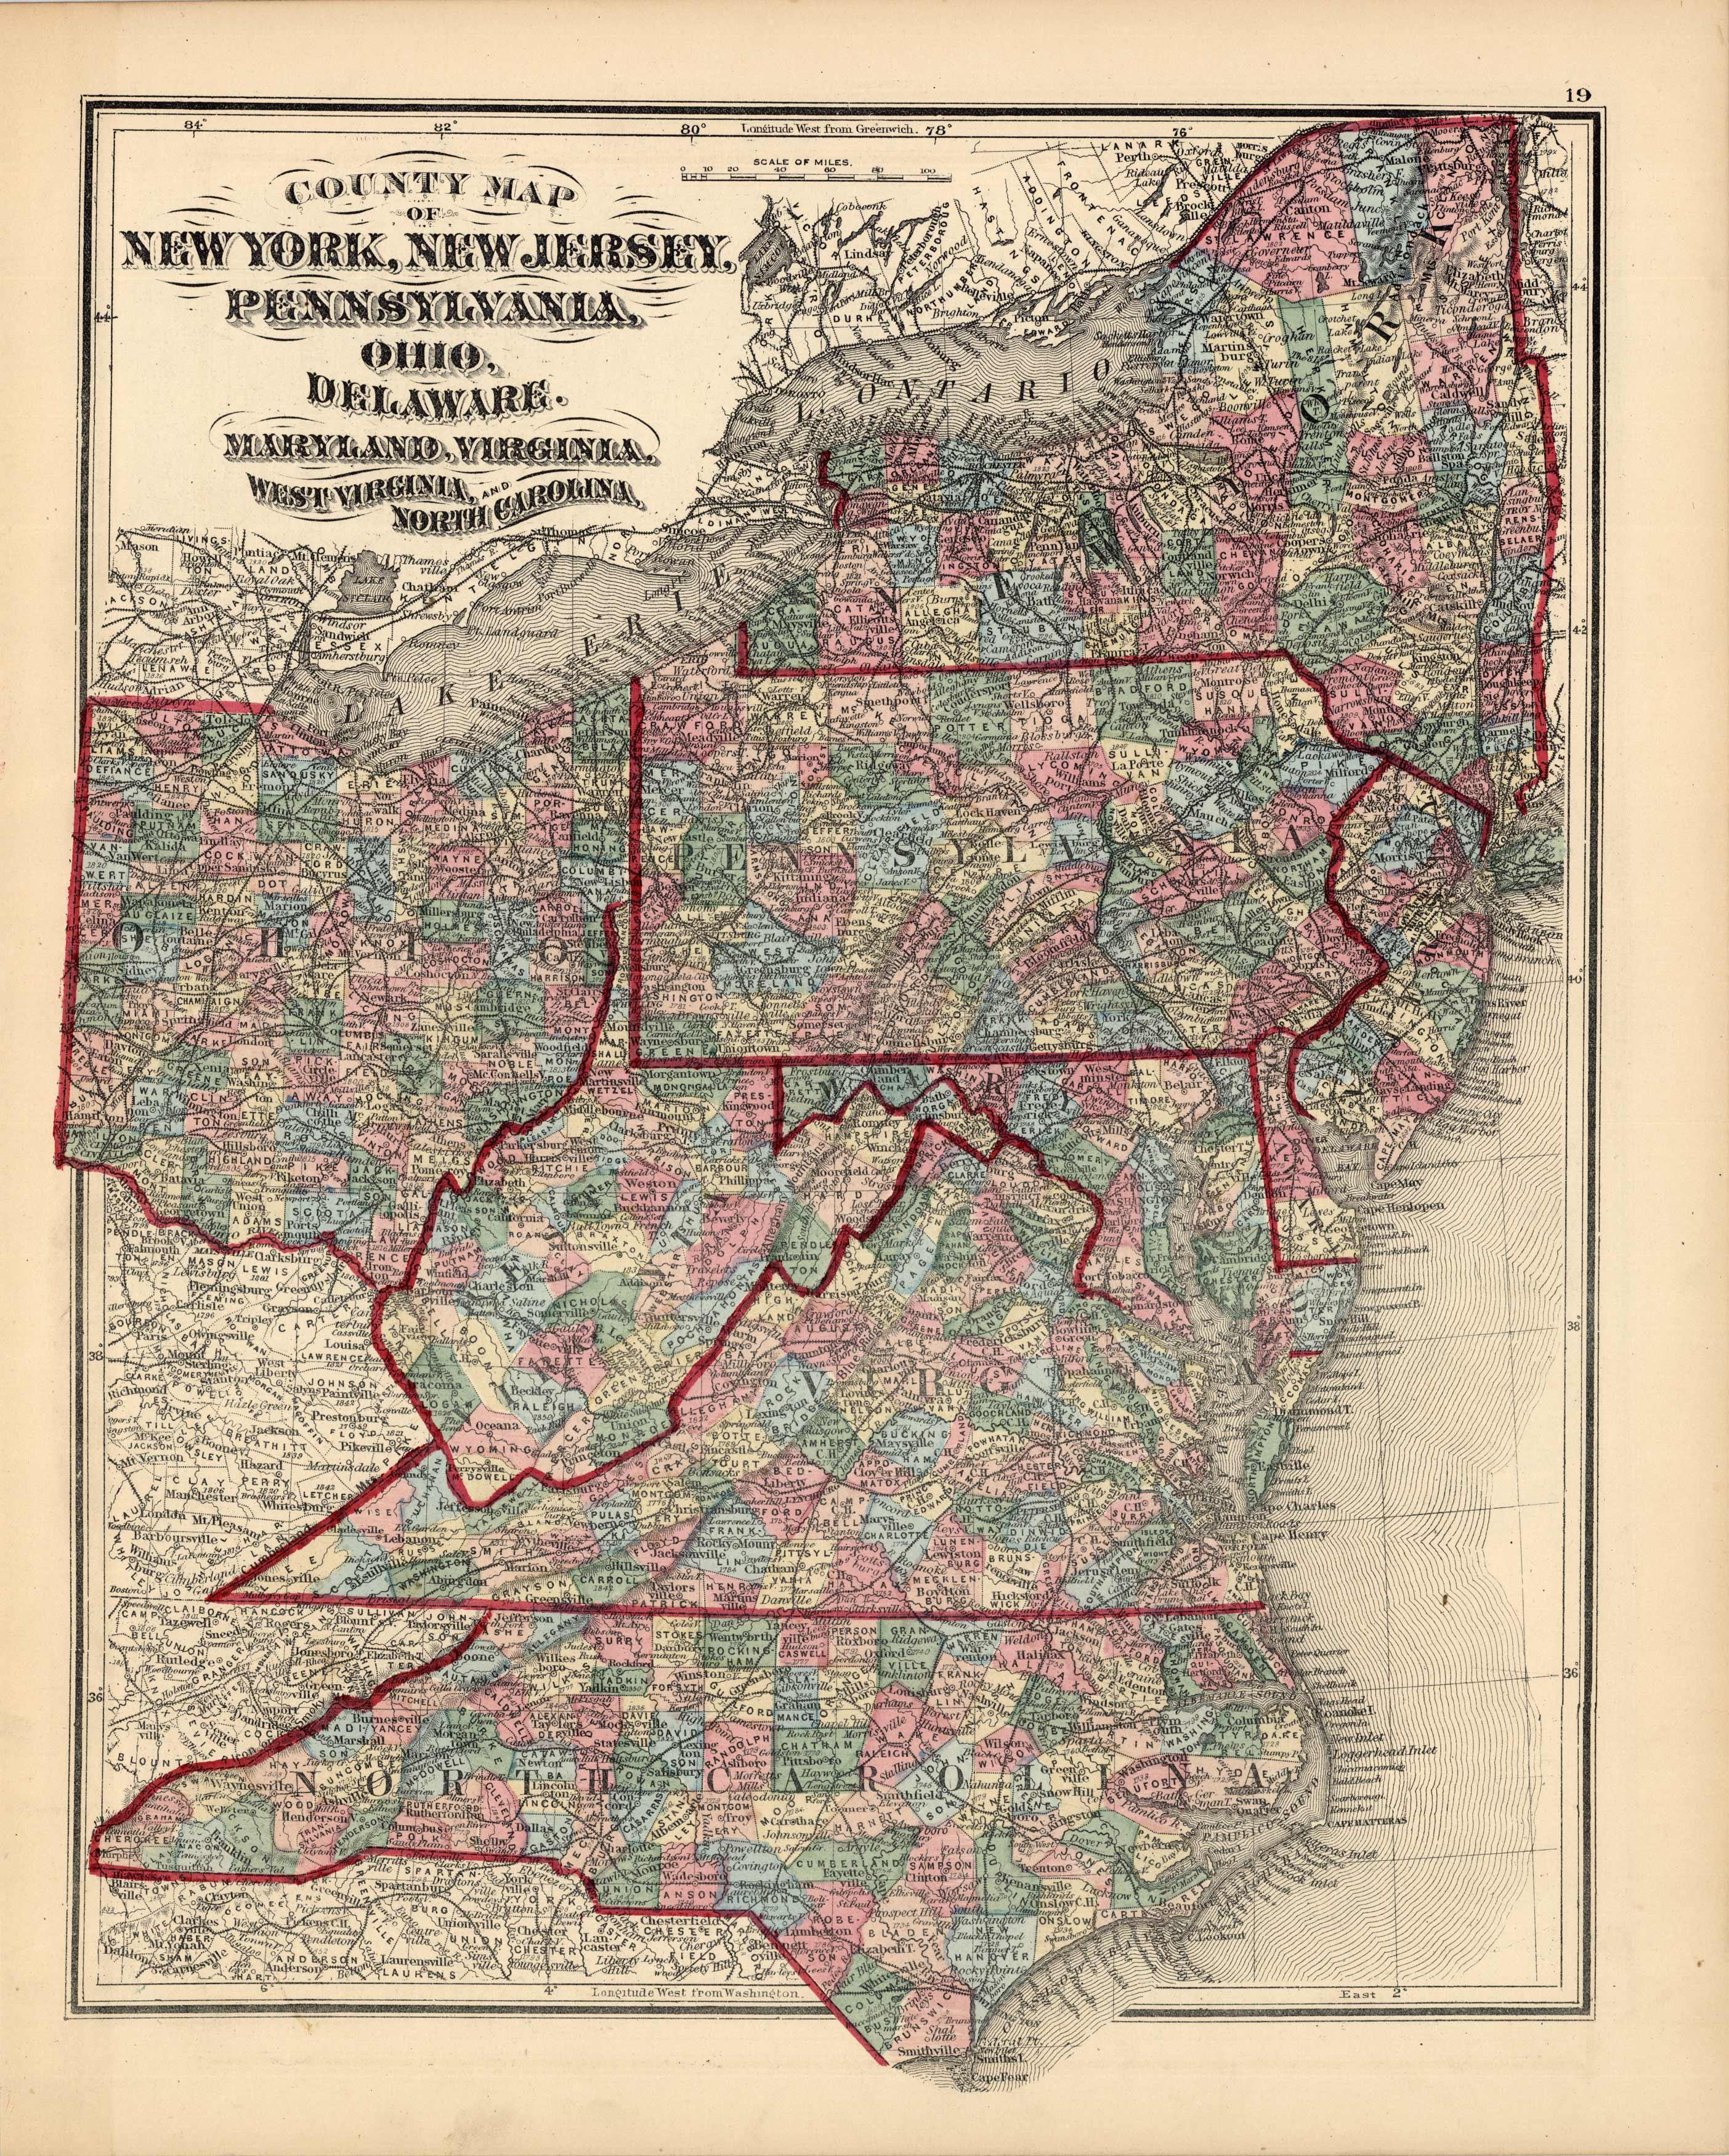 Map Of New York And Ohio.County Map Of New York New Jersey Pennsylvania Ohio Deleware Maryland Virginia West Virginia And North Carolina